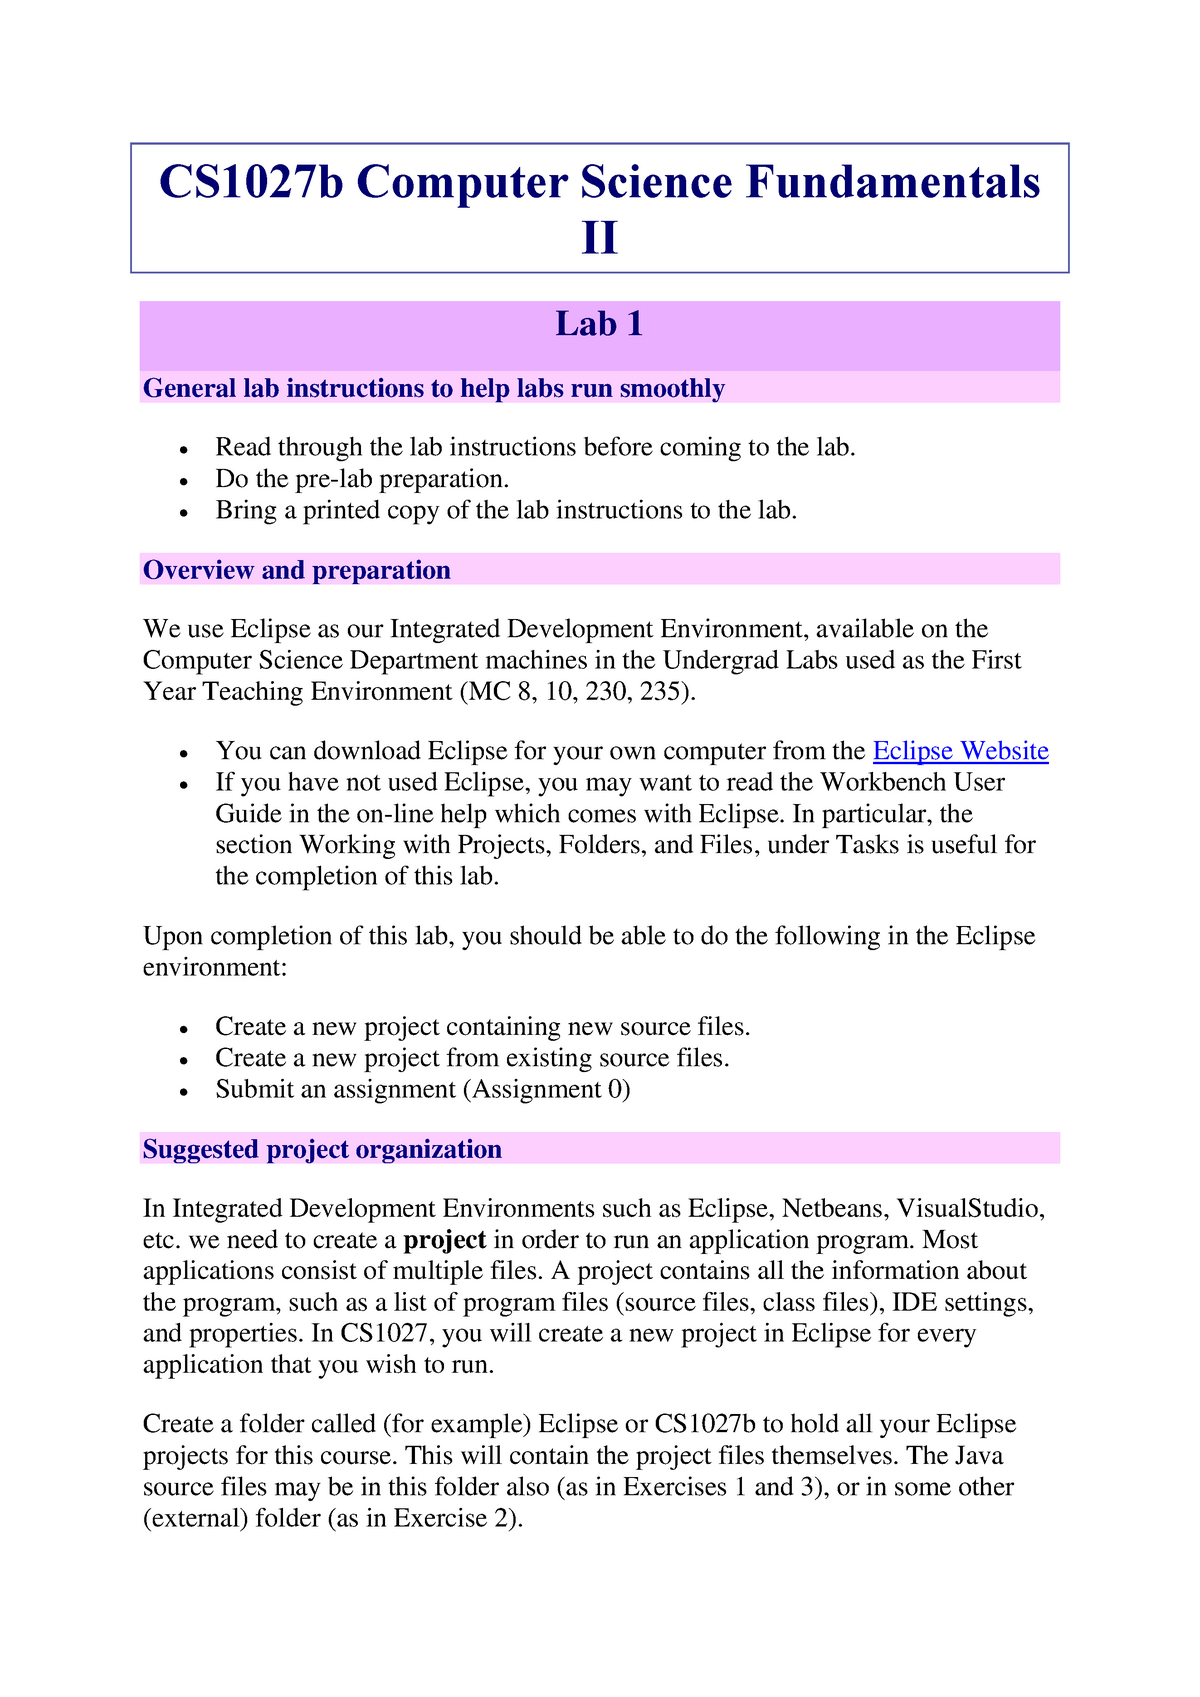 Lab 1, 3-7 - CS1027b Computer Science Fundamentals II - UWO